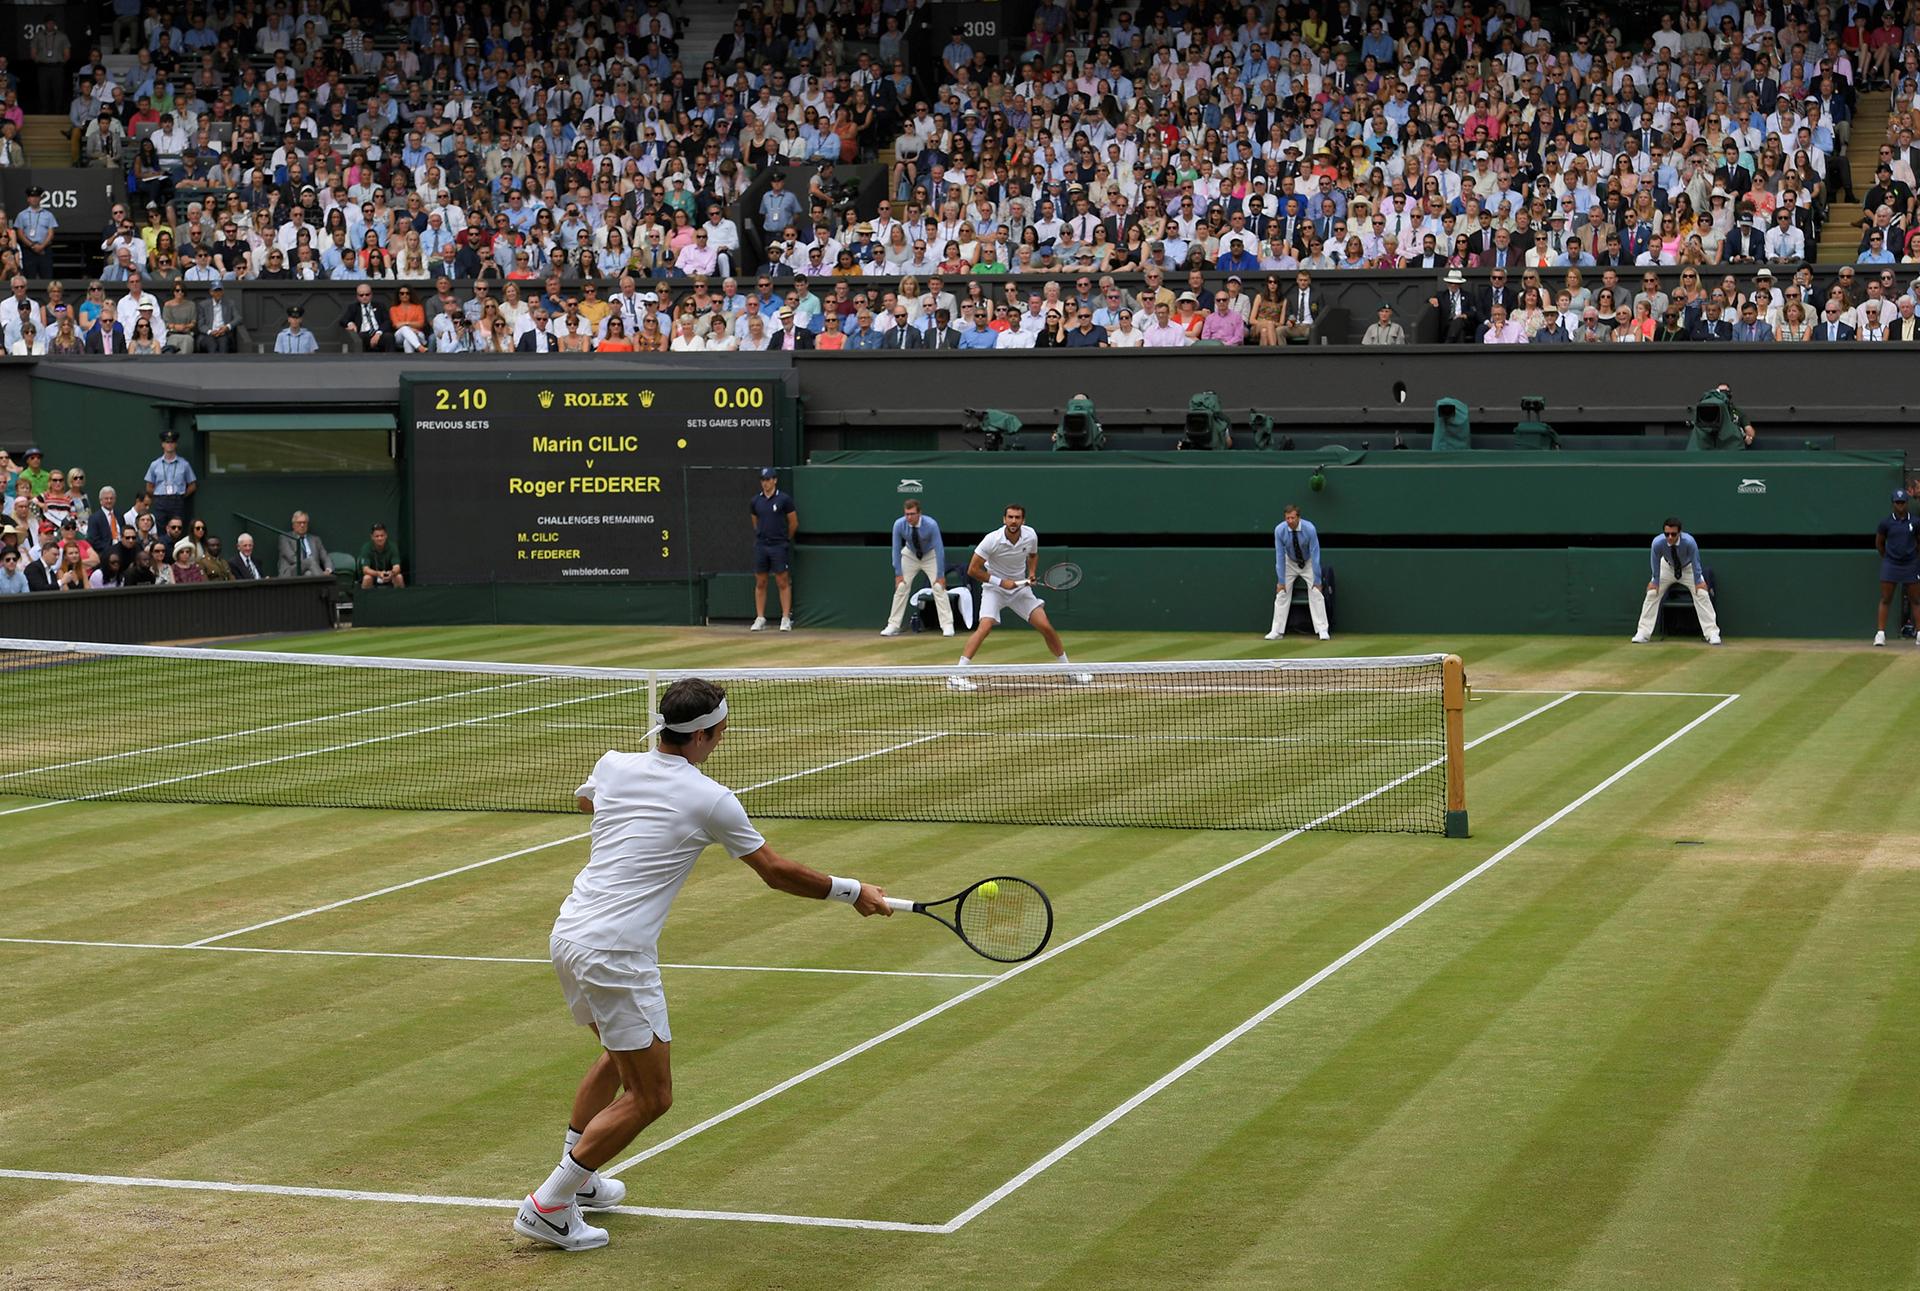 La devolución de Roger Federer durante el primer set REUTERS/Toby Melville